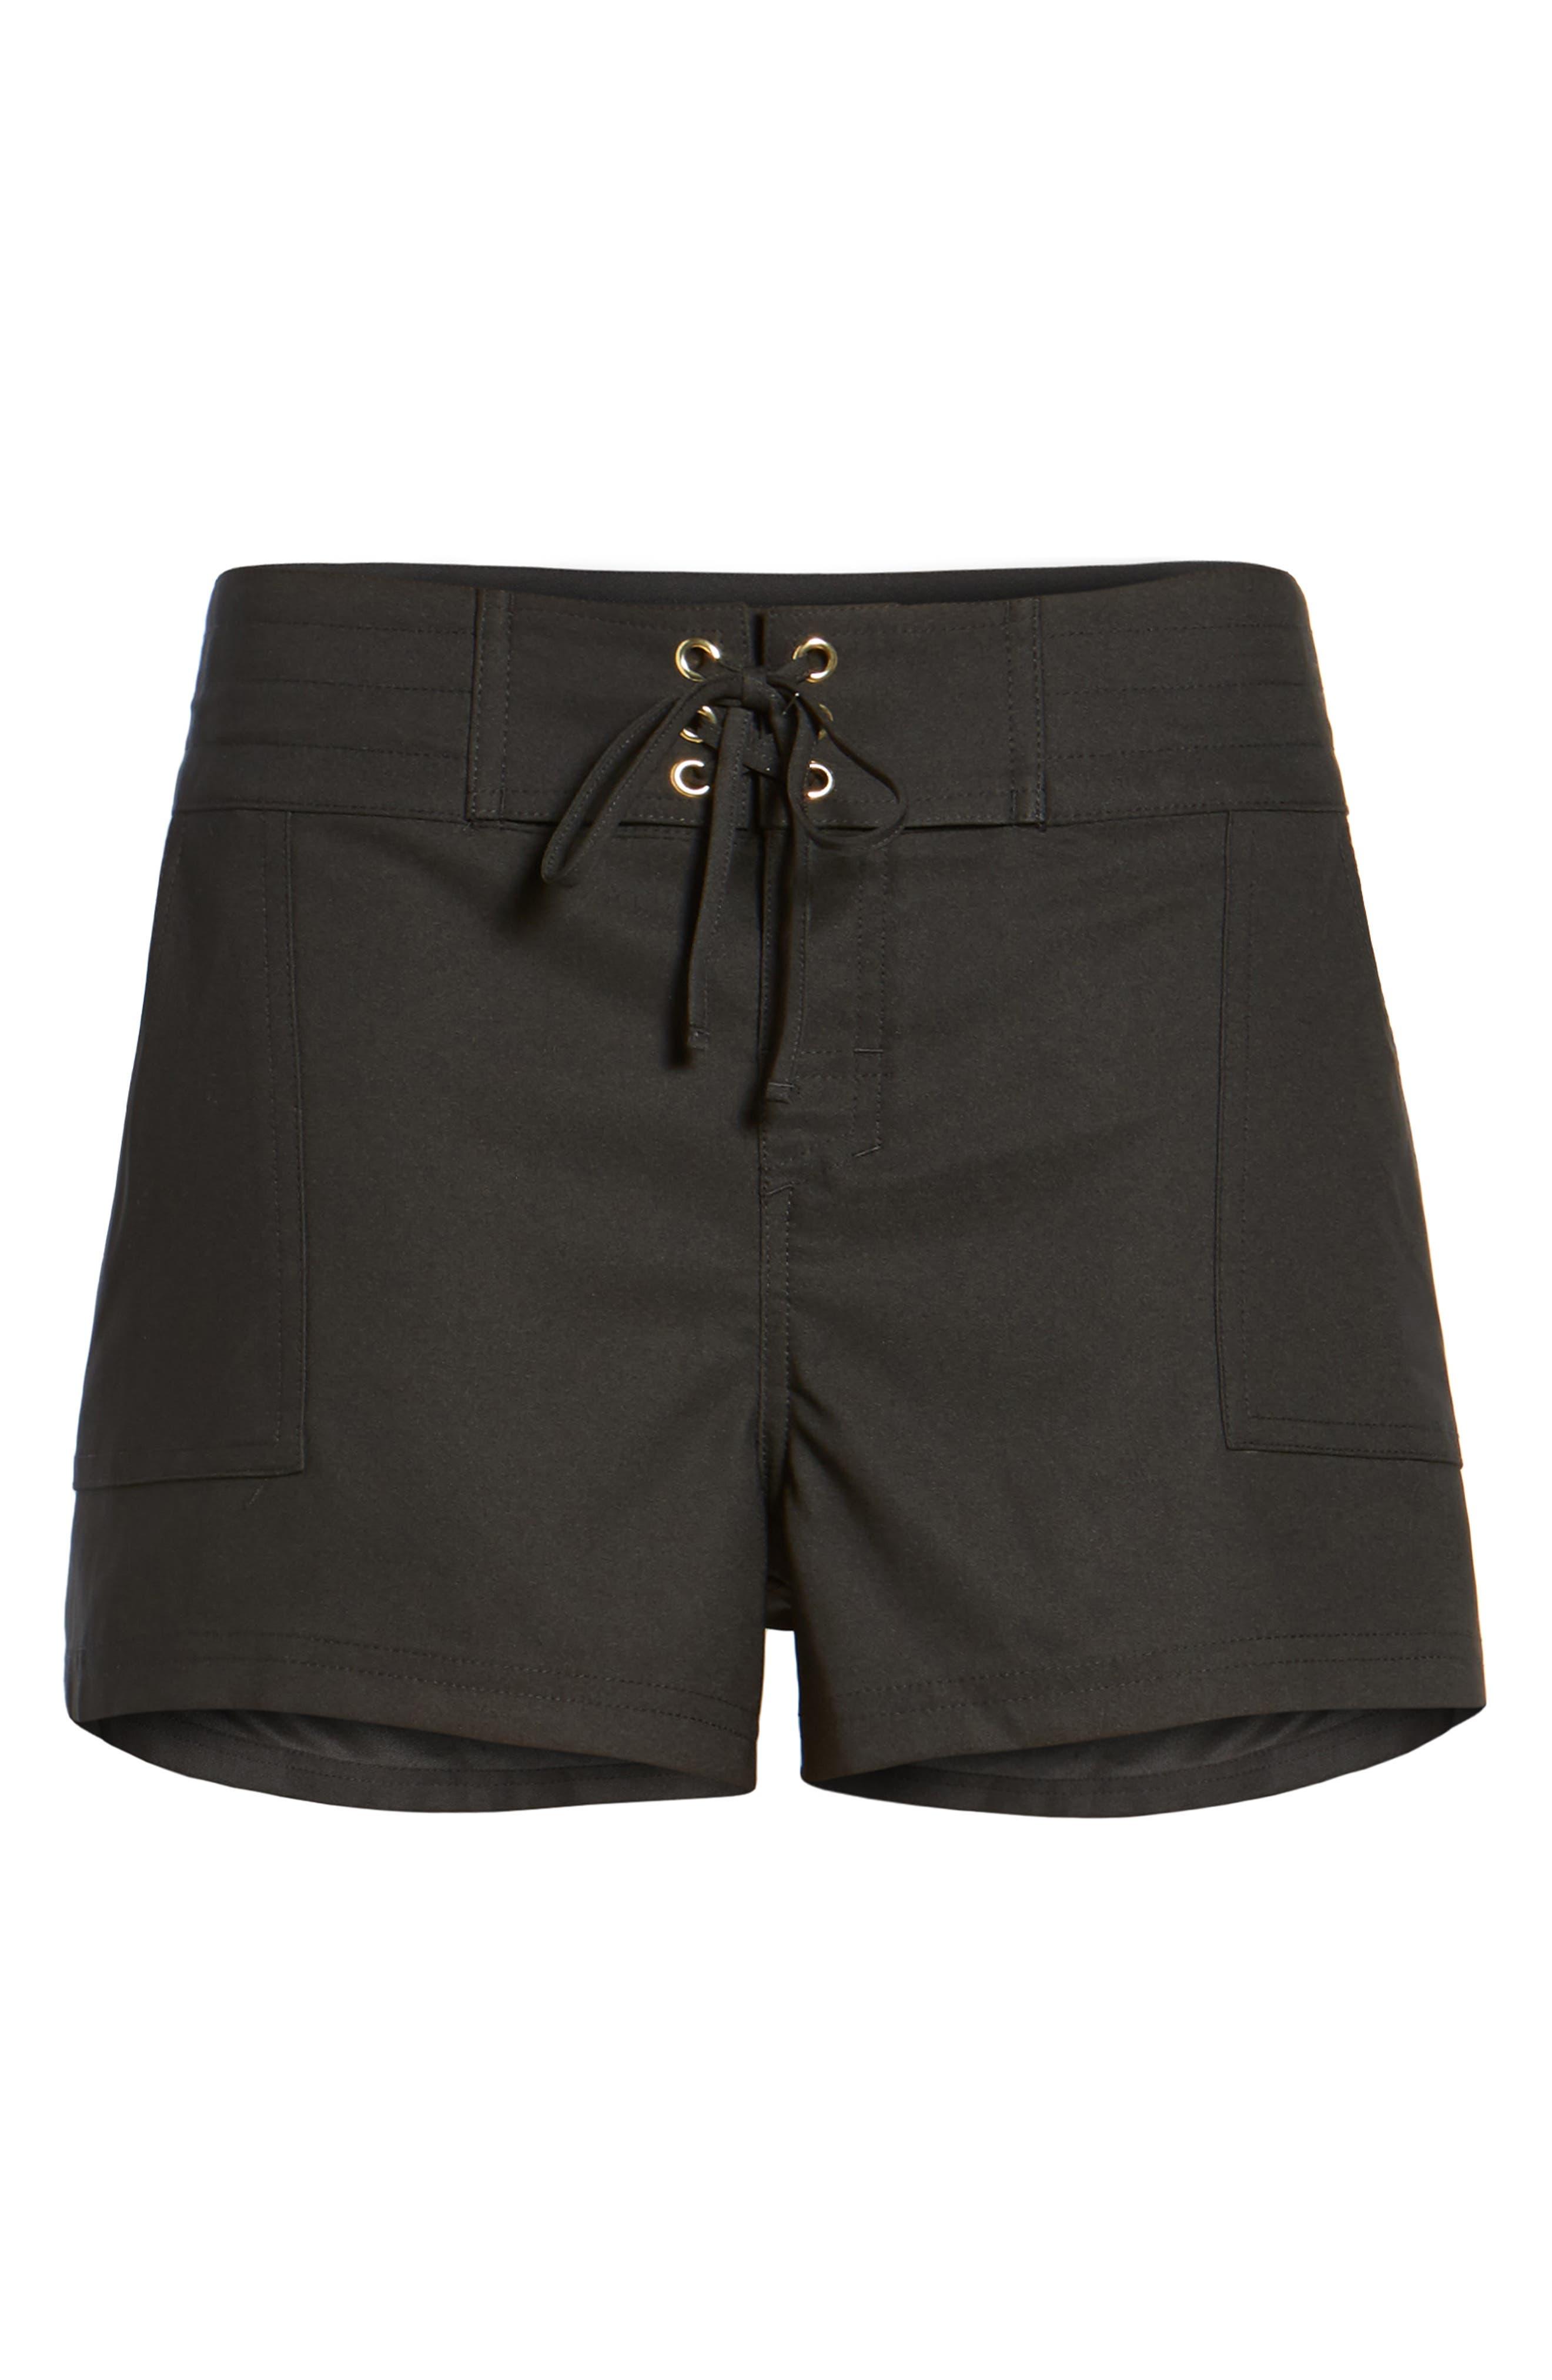 'Boardwalk' Shorts,                         Main,                         color, BLACK